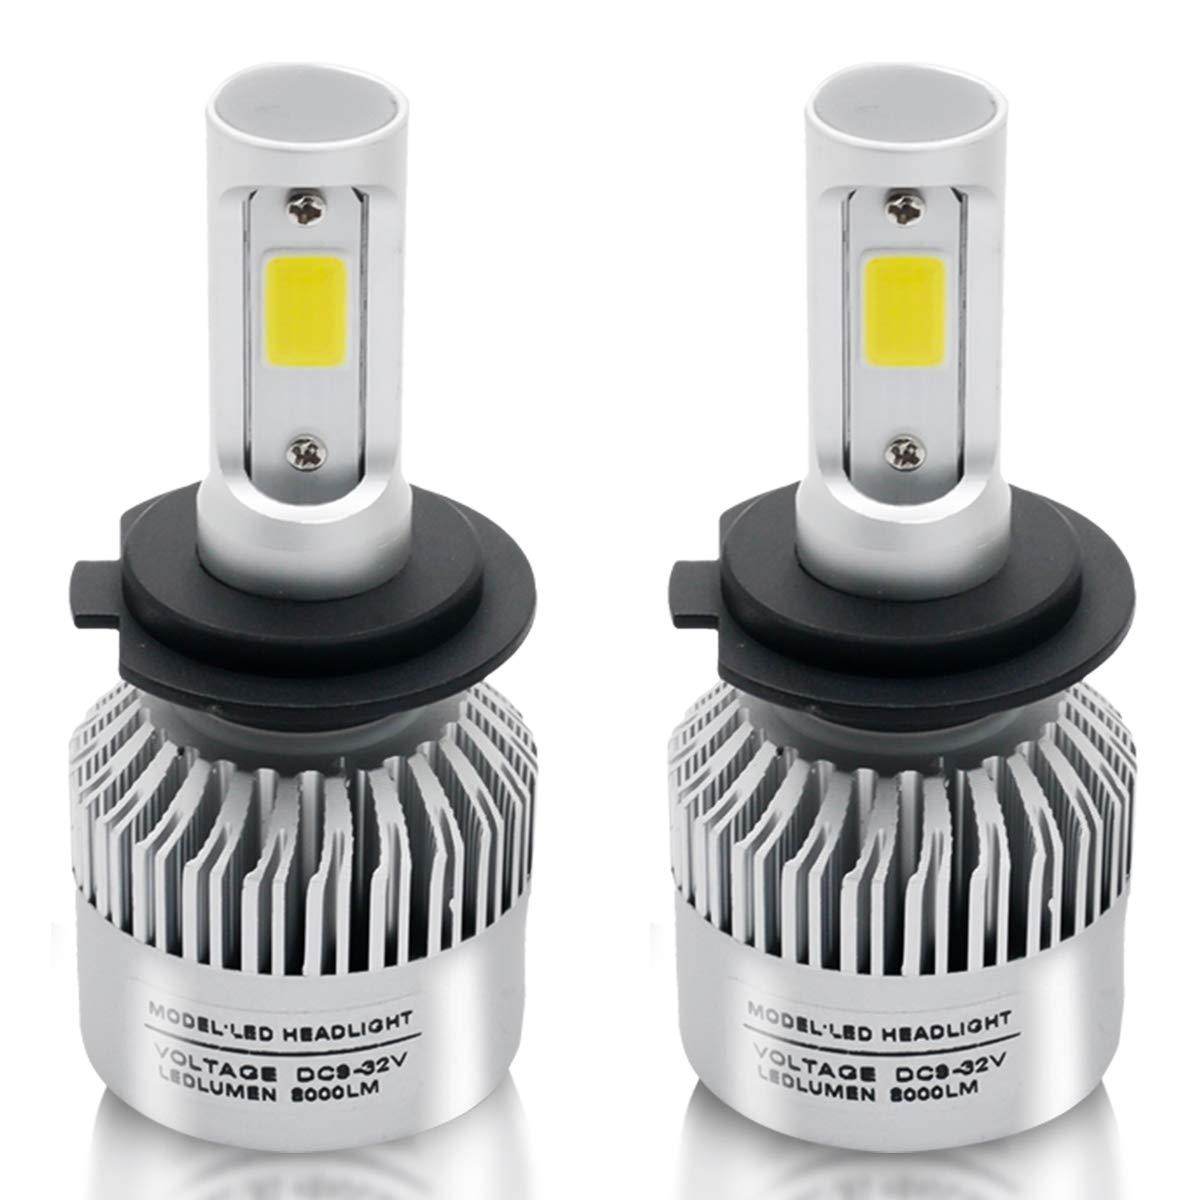 LED Headlight Bulbs H7 Conversion Kits,Maso Car LED Headlights 72W/Pair 6000K 8000LM Super Bright COB Chips